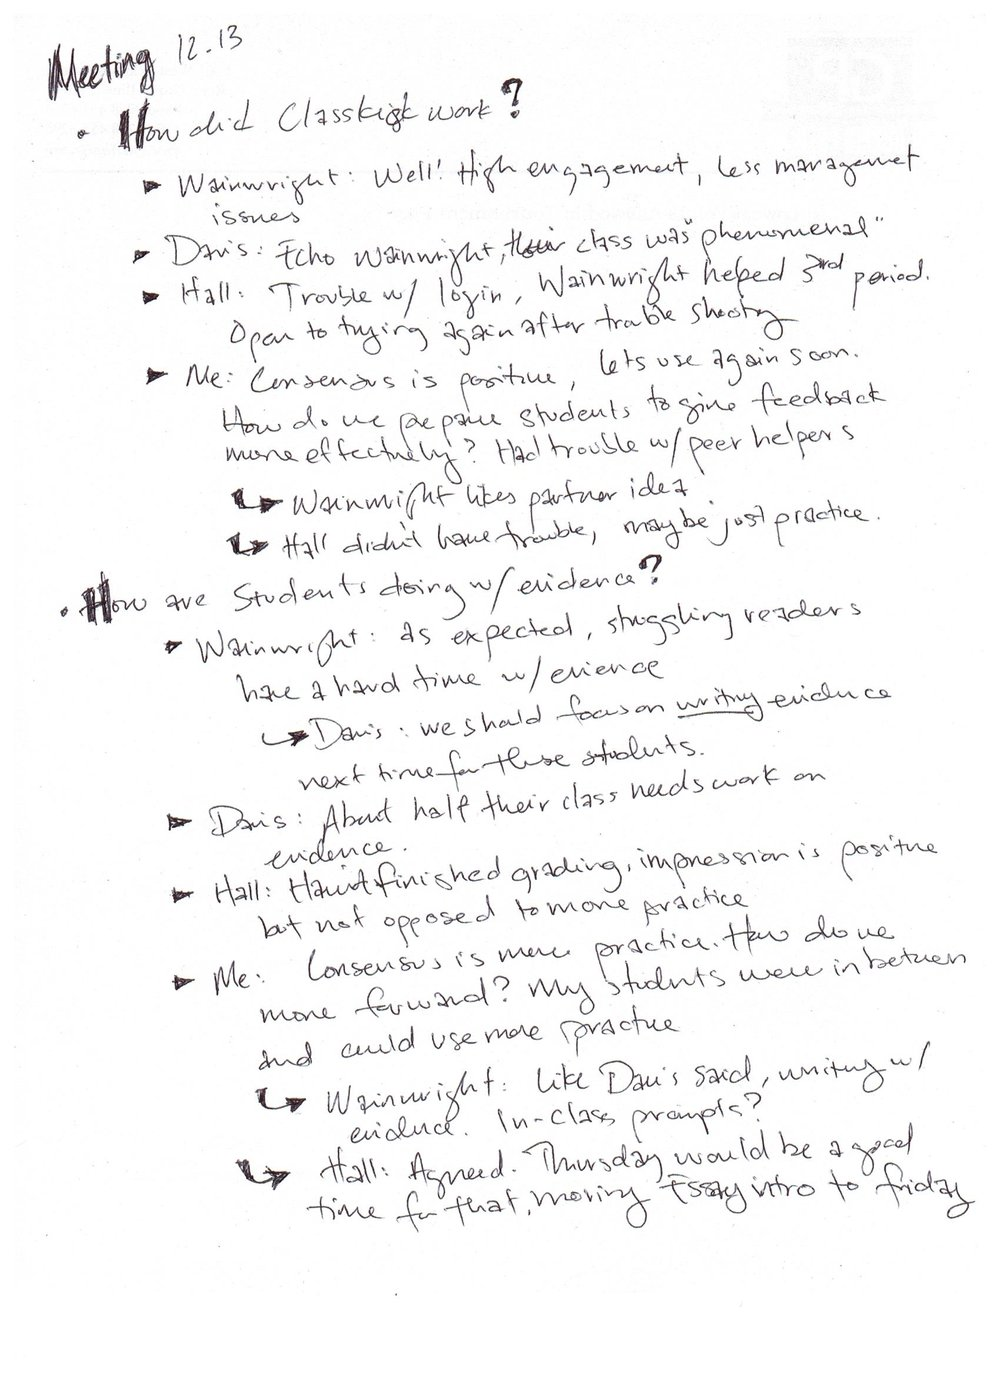 Justin Johanson Collaboration Challenge Notes